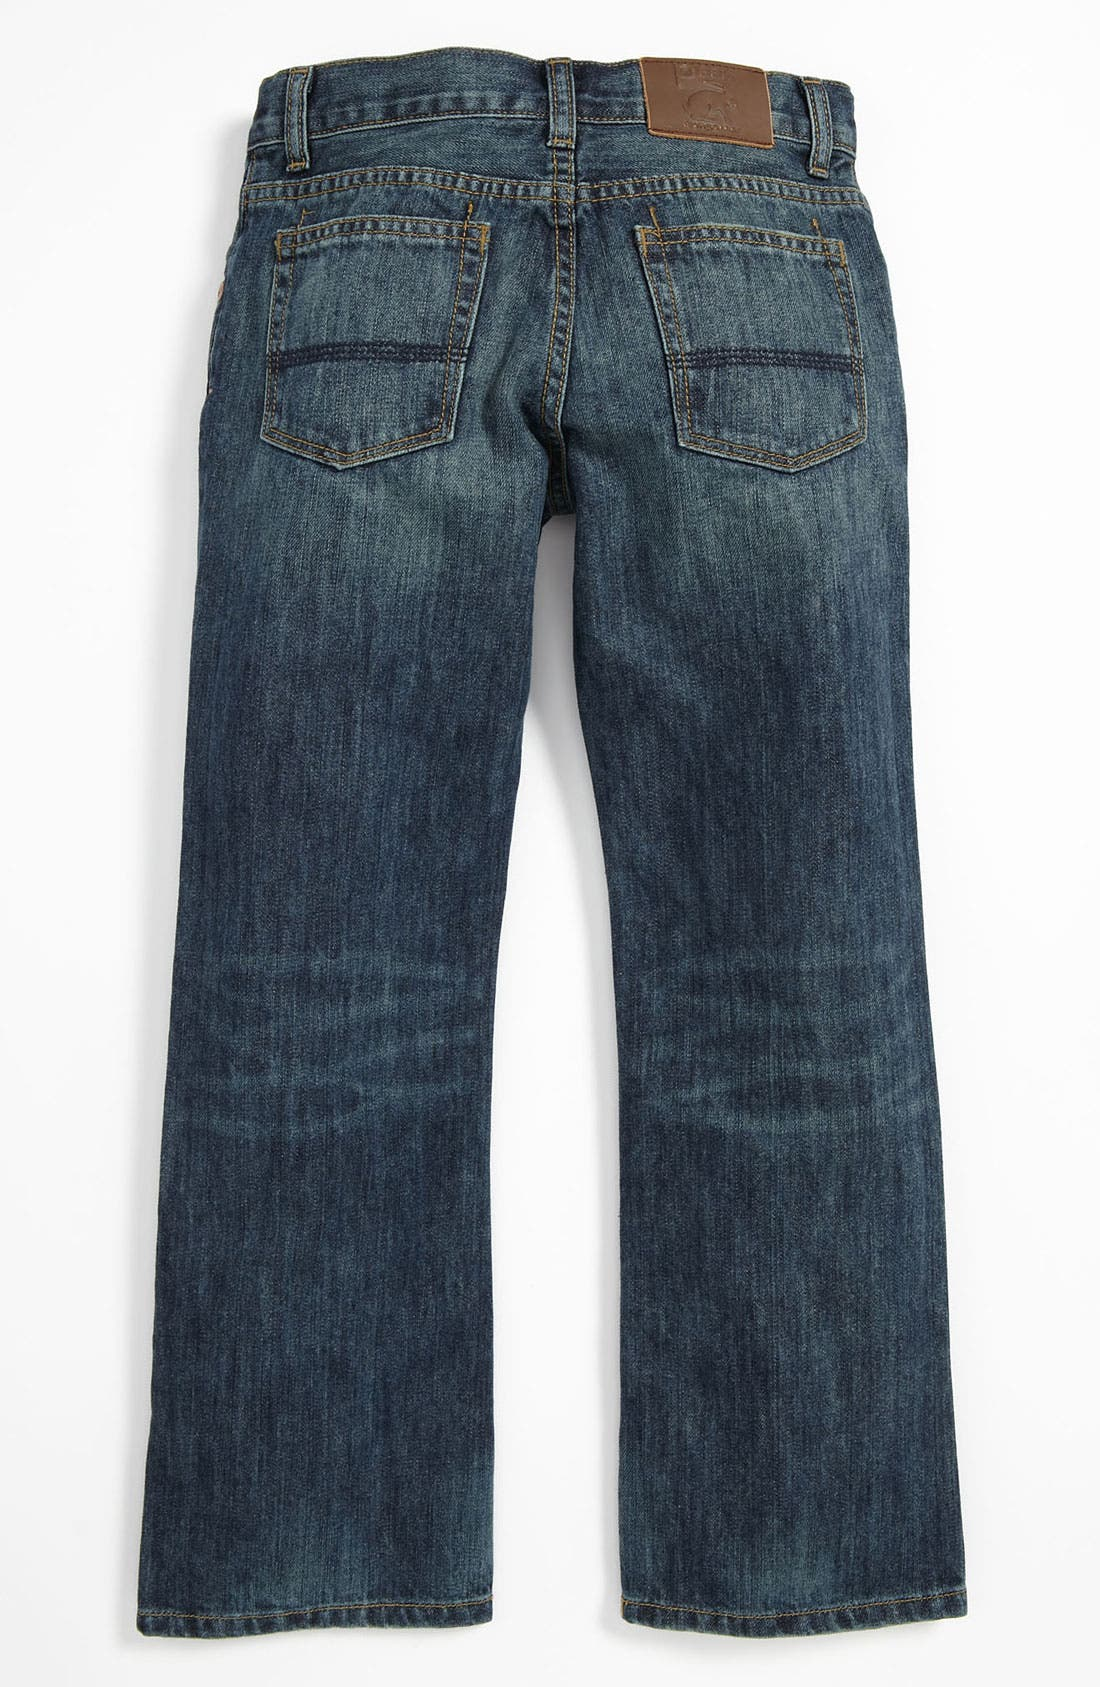 Main Image - Peek 'Sullivan' Jeans (Toddler, Little Boys & Big Boys)